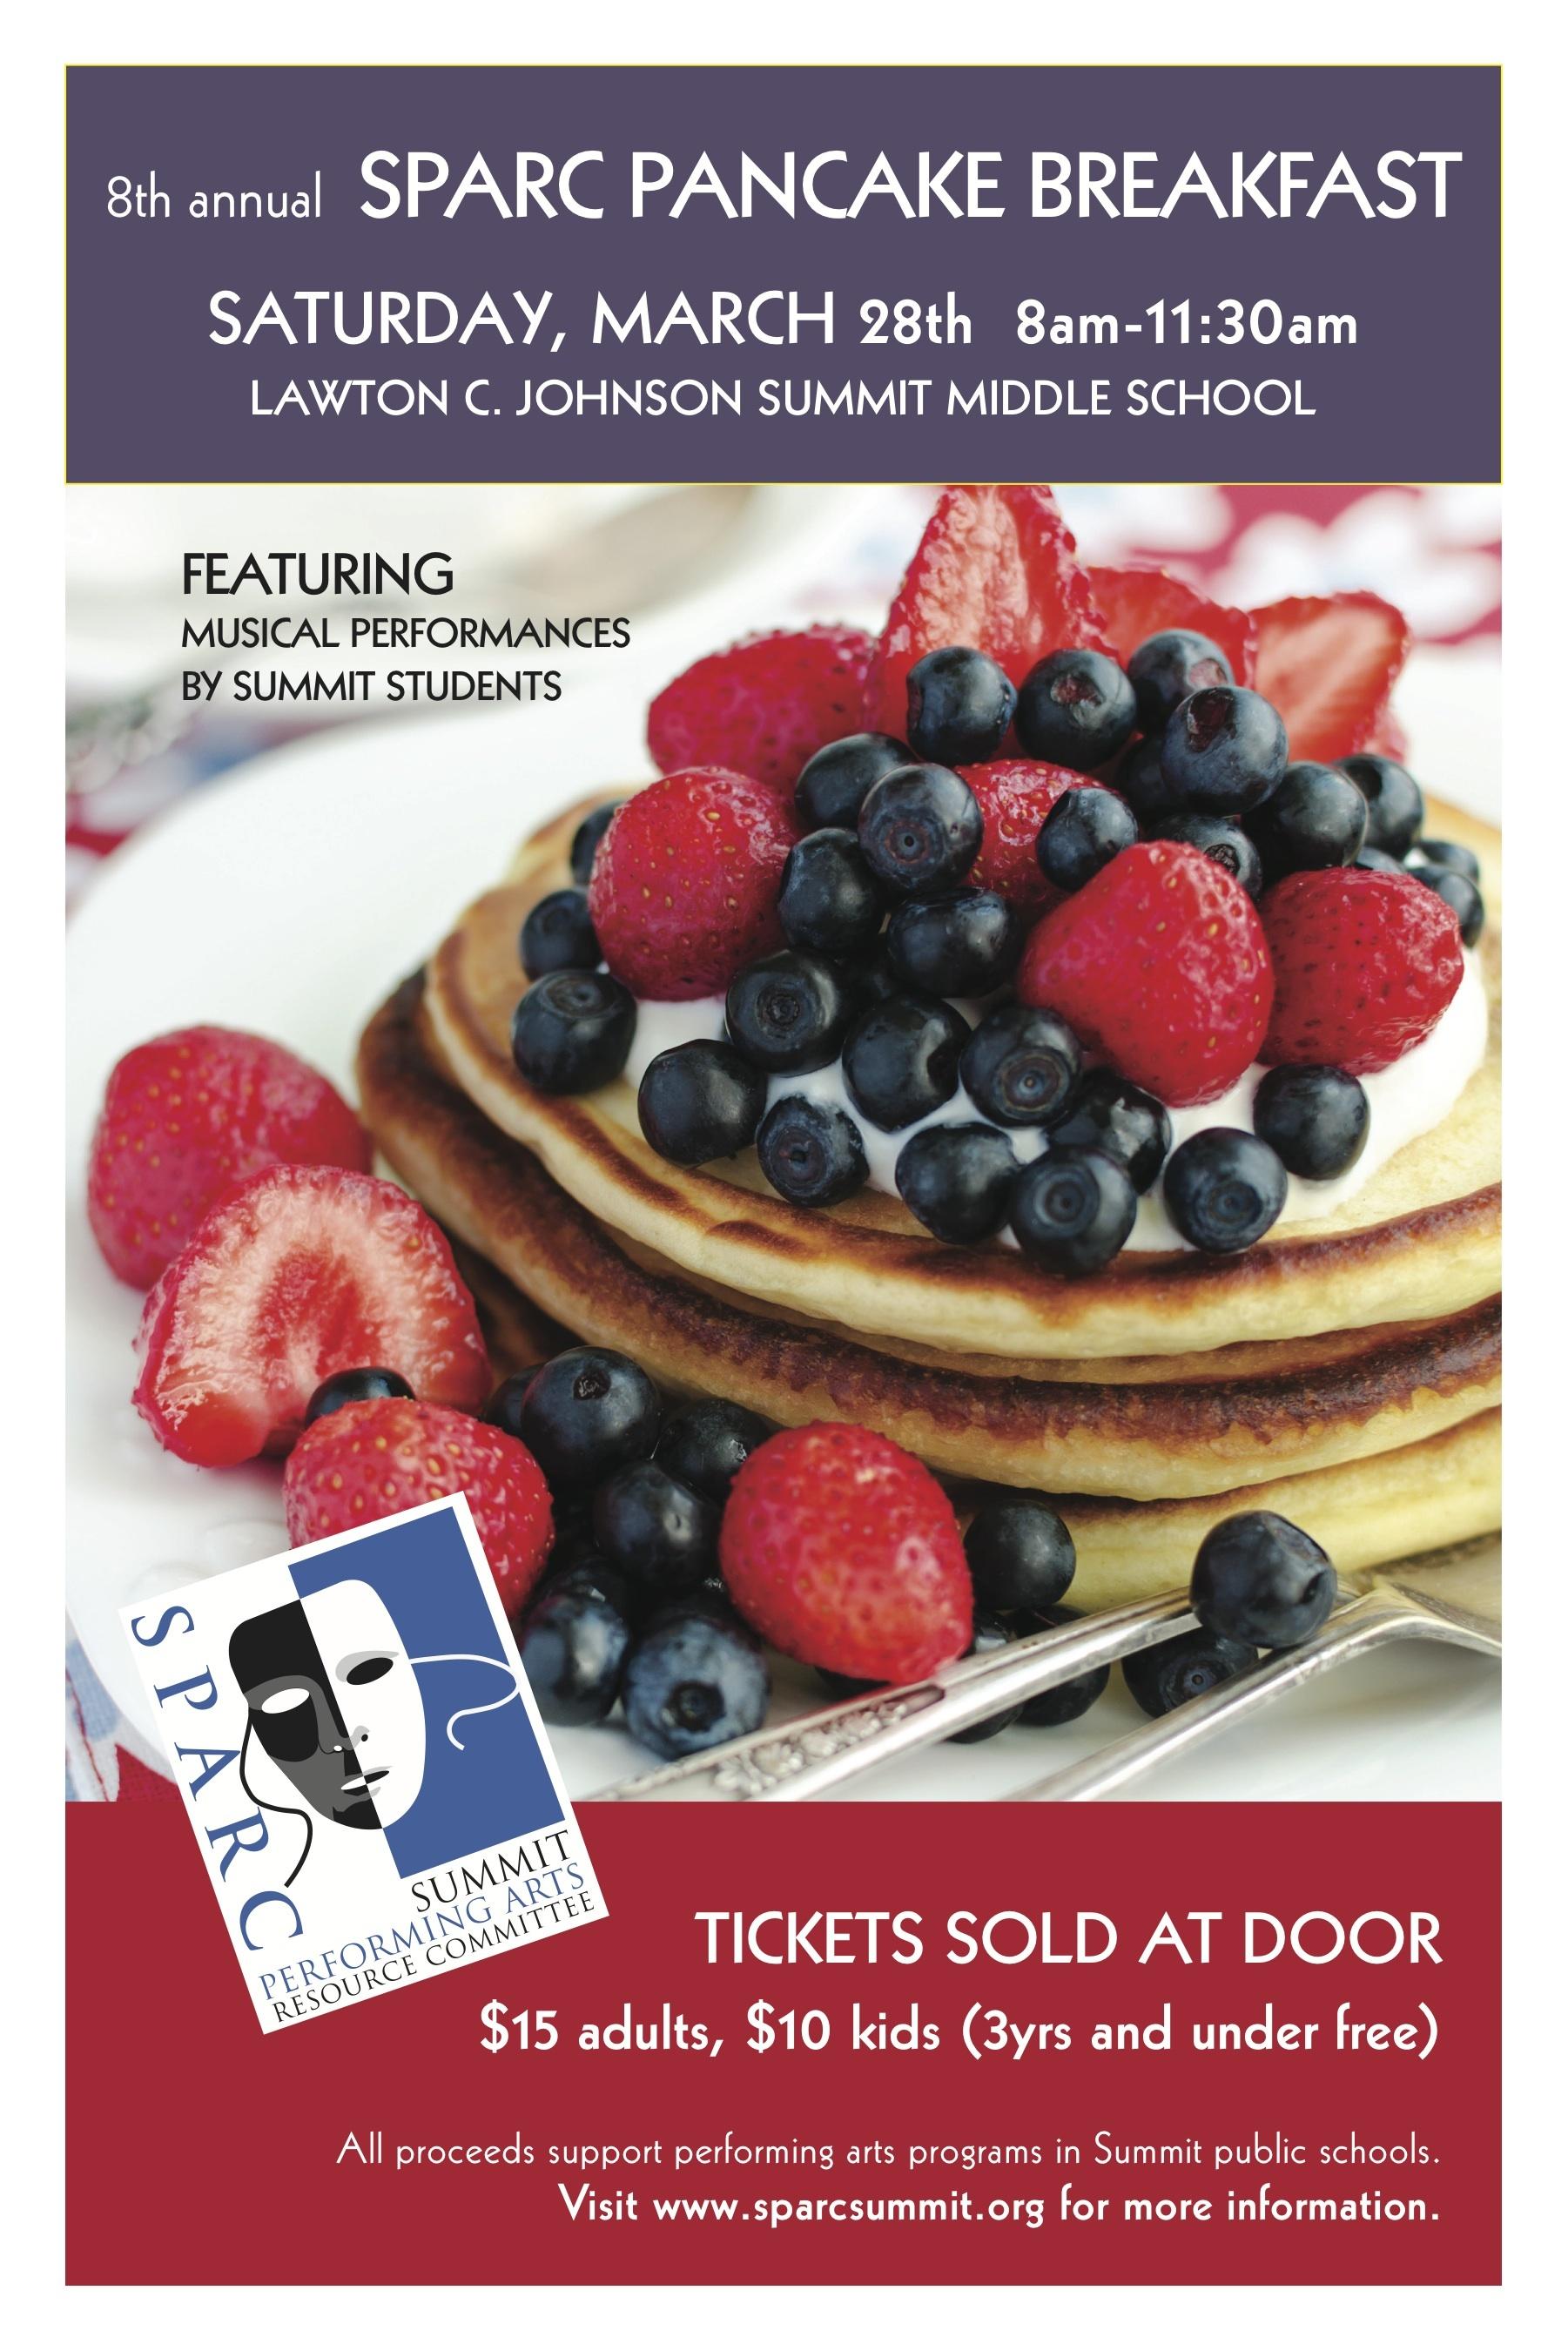 f68630a5f88c08b85609_2015_Pancake_Breakfast_Poster.jpg